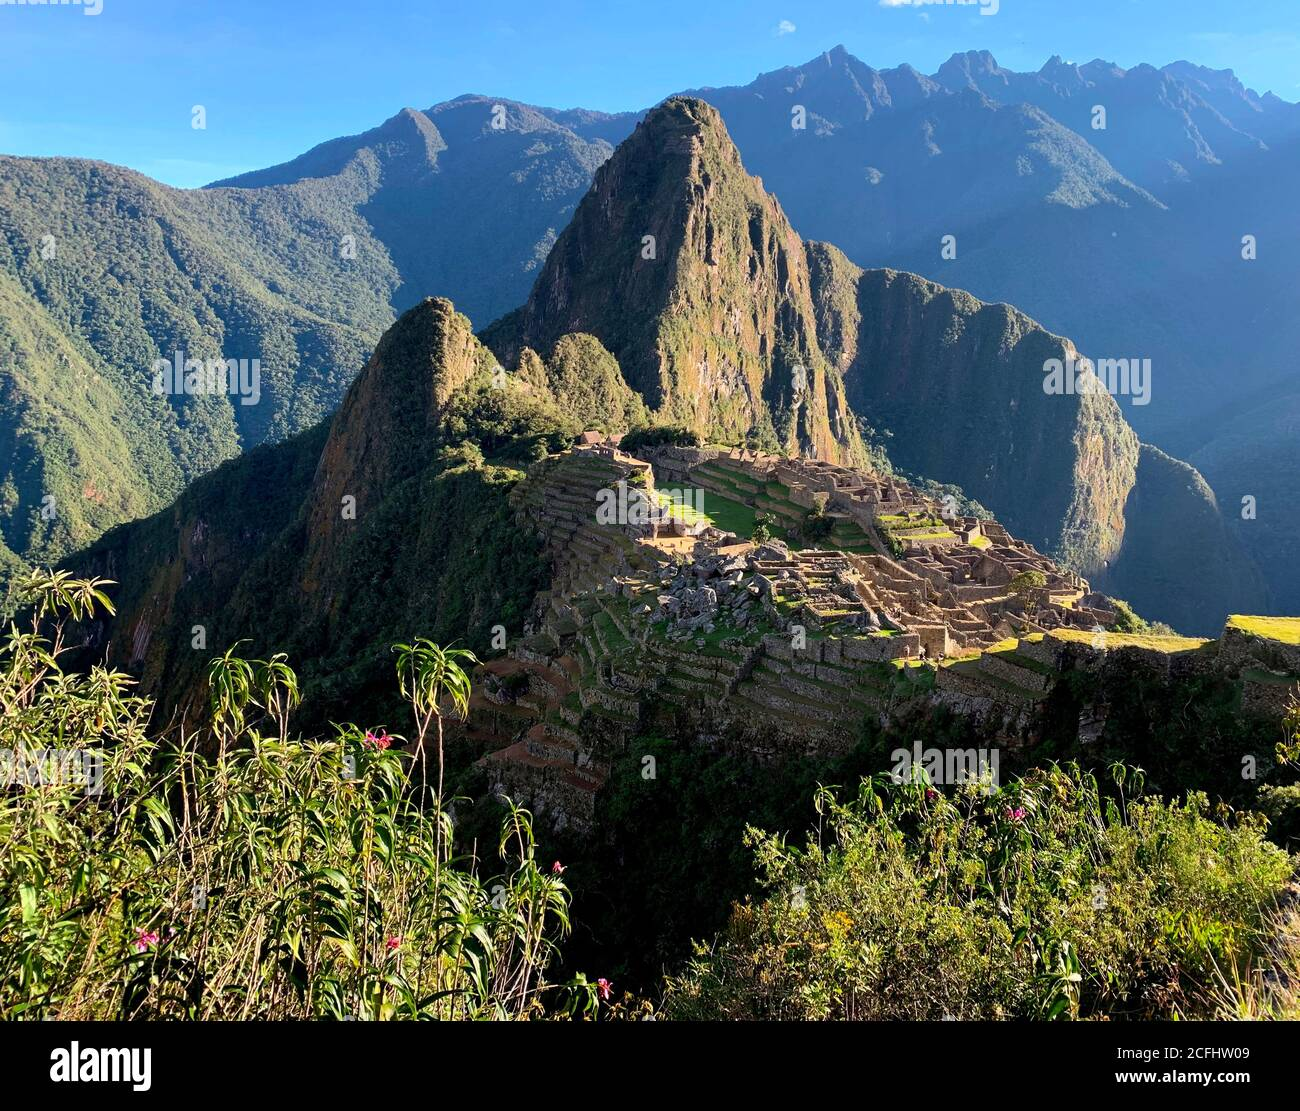 Machu Picchu Inca loct city fortress in Andes mountains Peru South America. Stock Photo